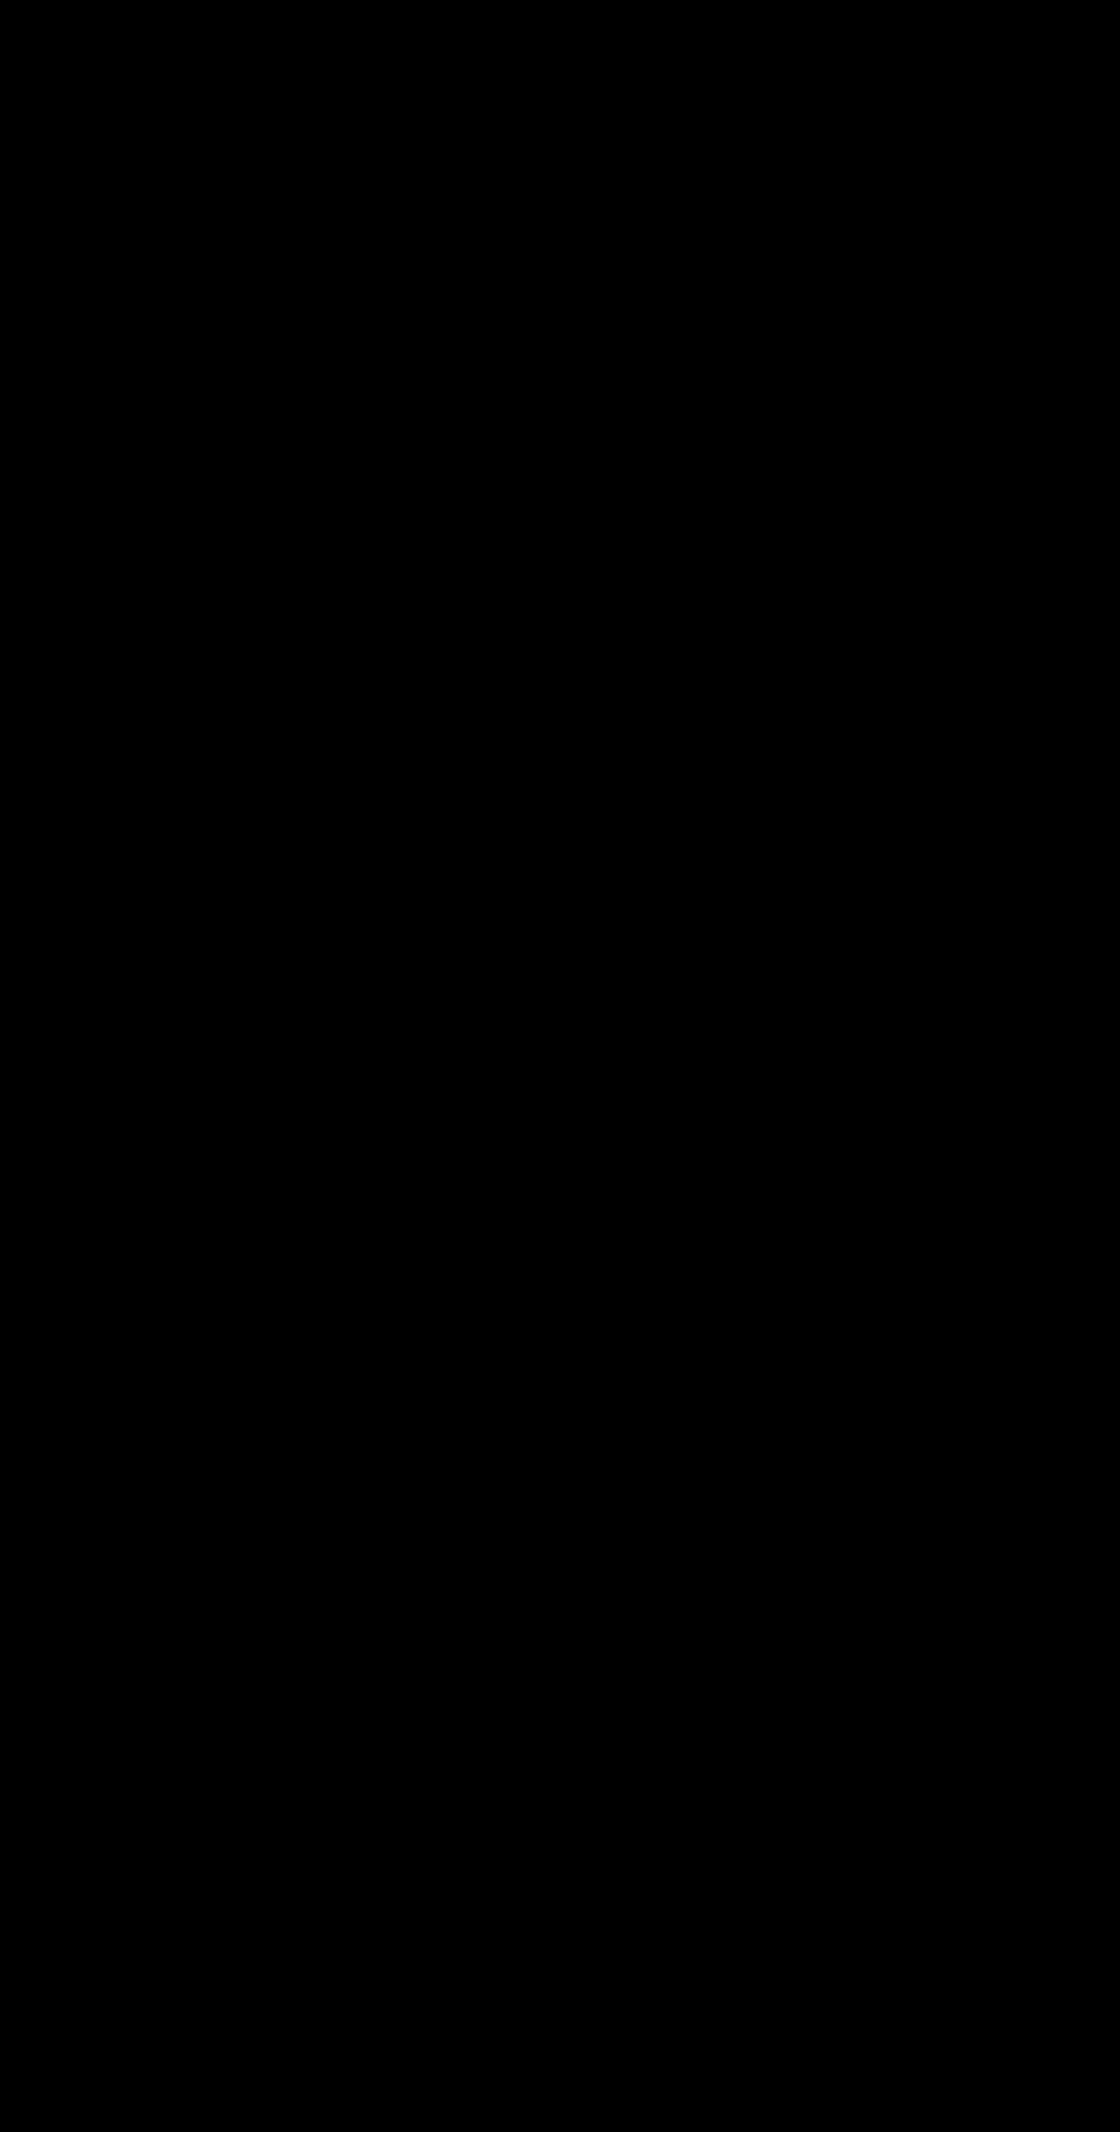 Old dead tree silhouette. Pinecone clipart gymnosperm